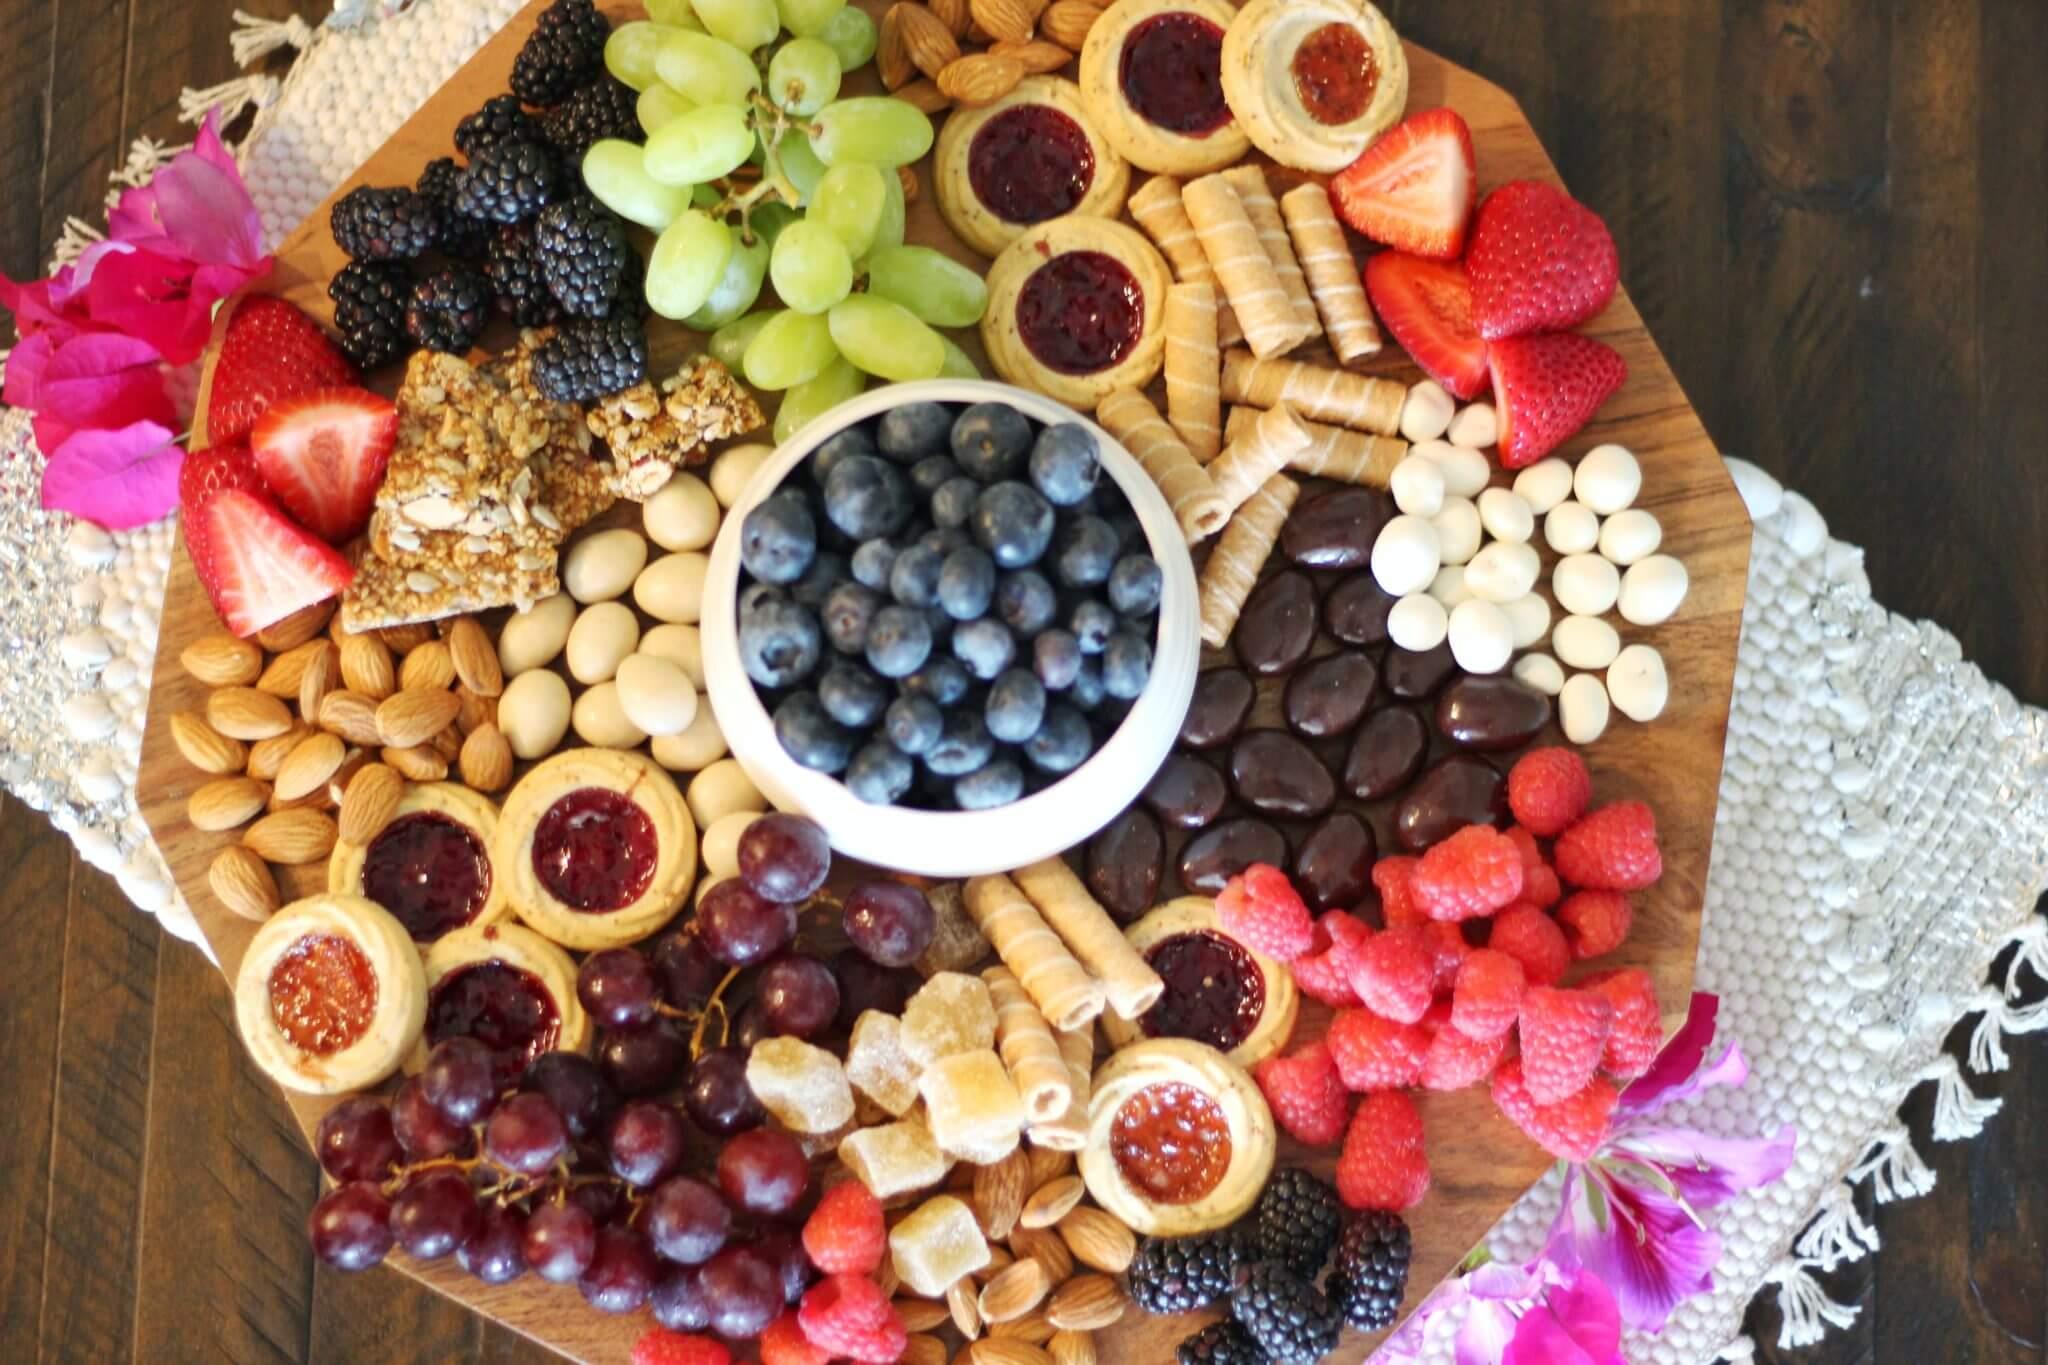 Springtime Grazing Platter Wish Farms Organic Florida Berry Farm